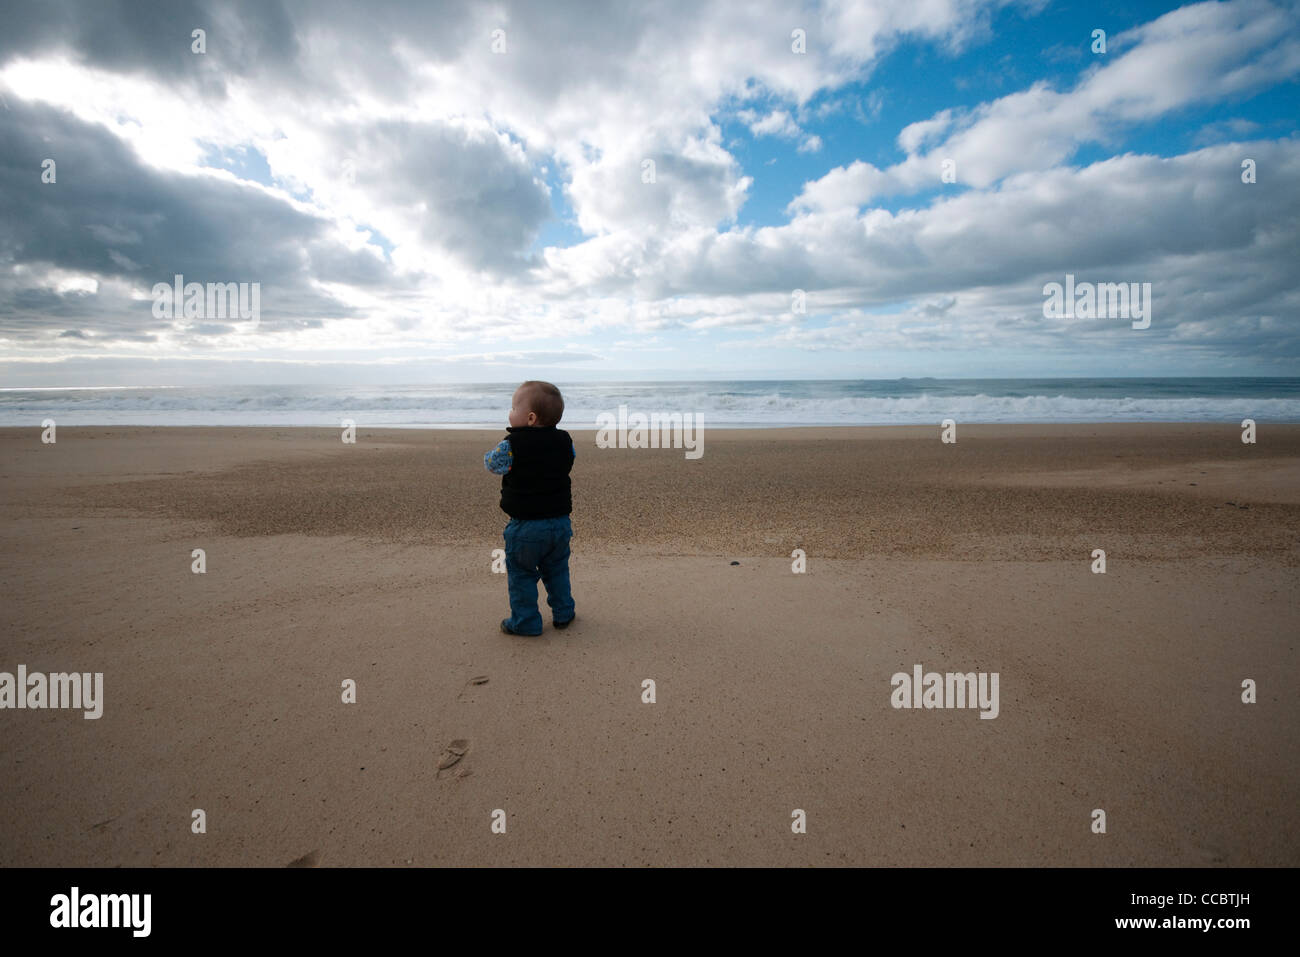 Toddler walking on beach, rear view - Stock Image